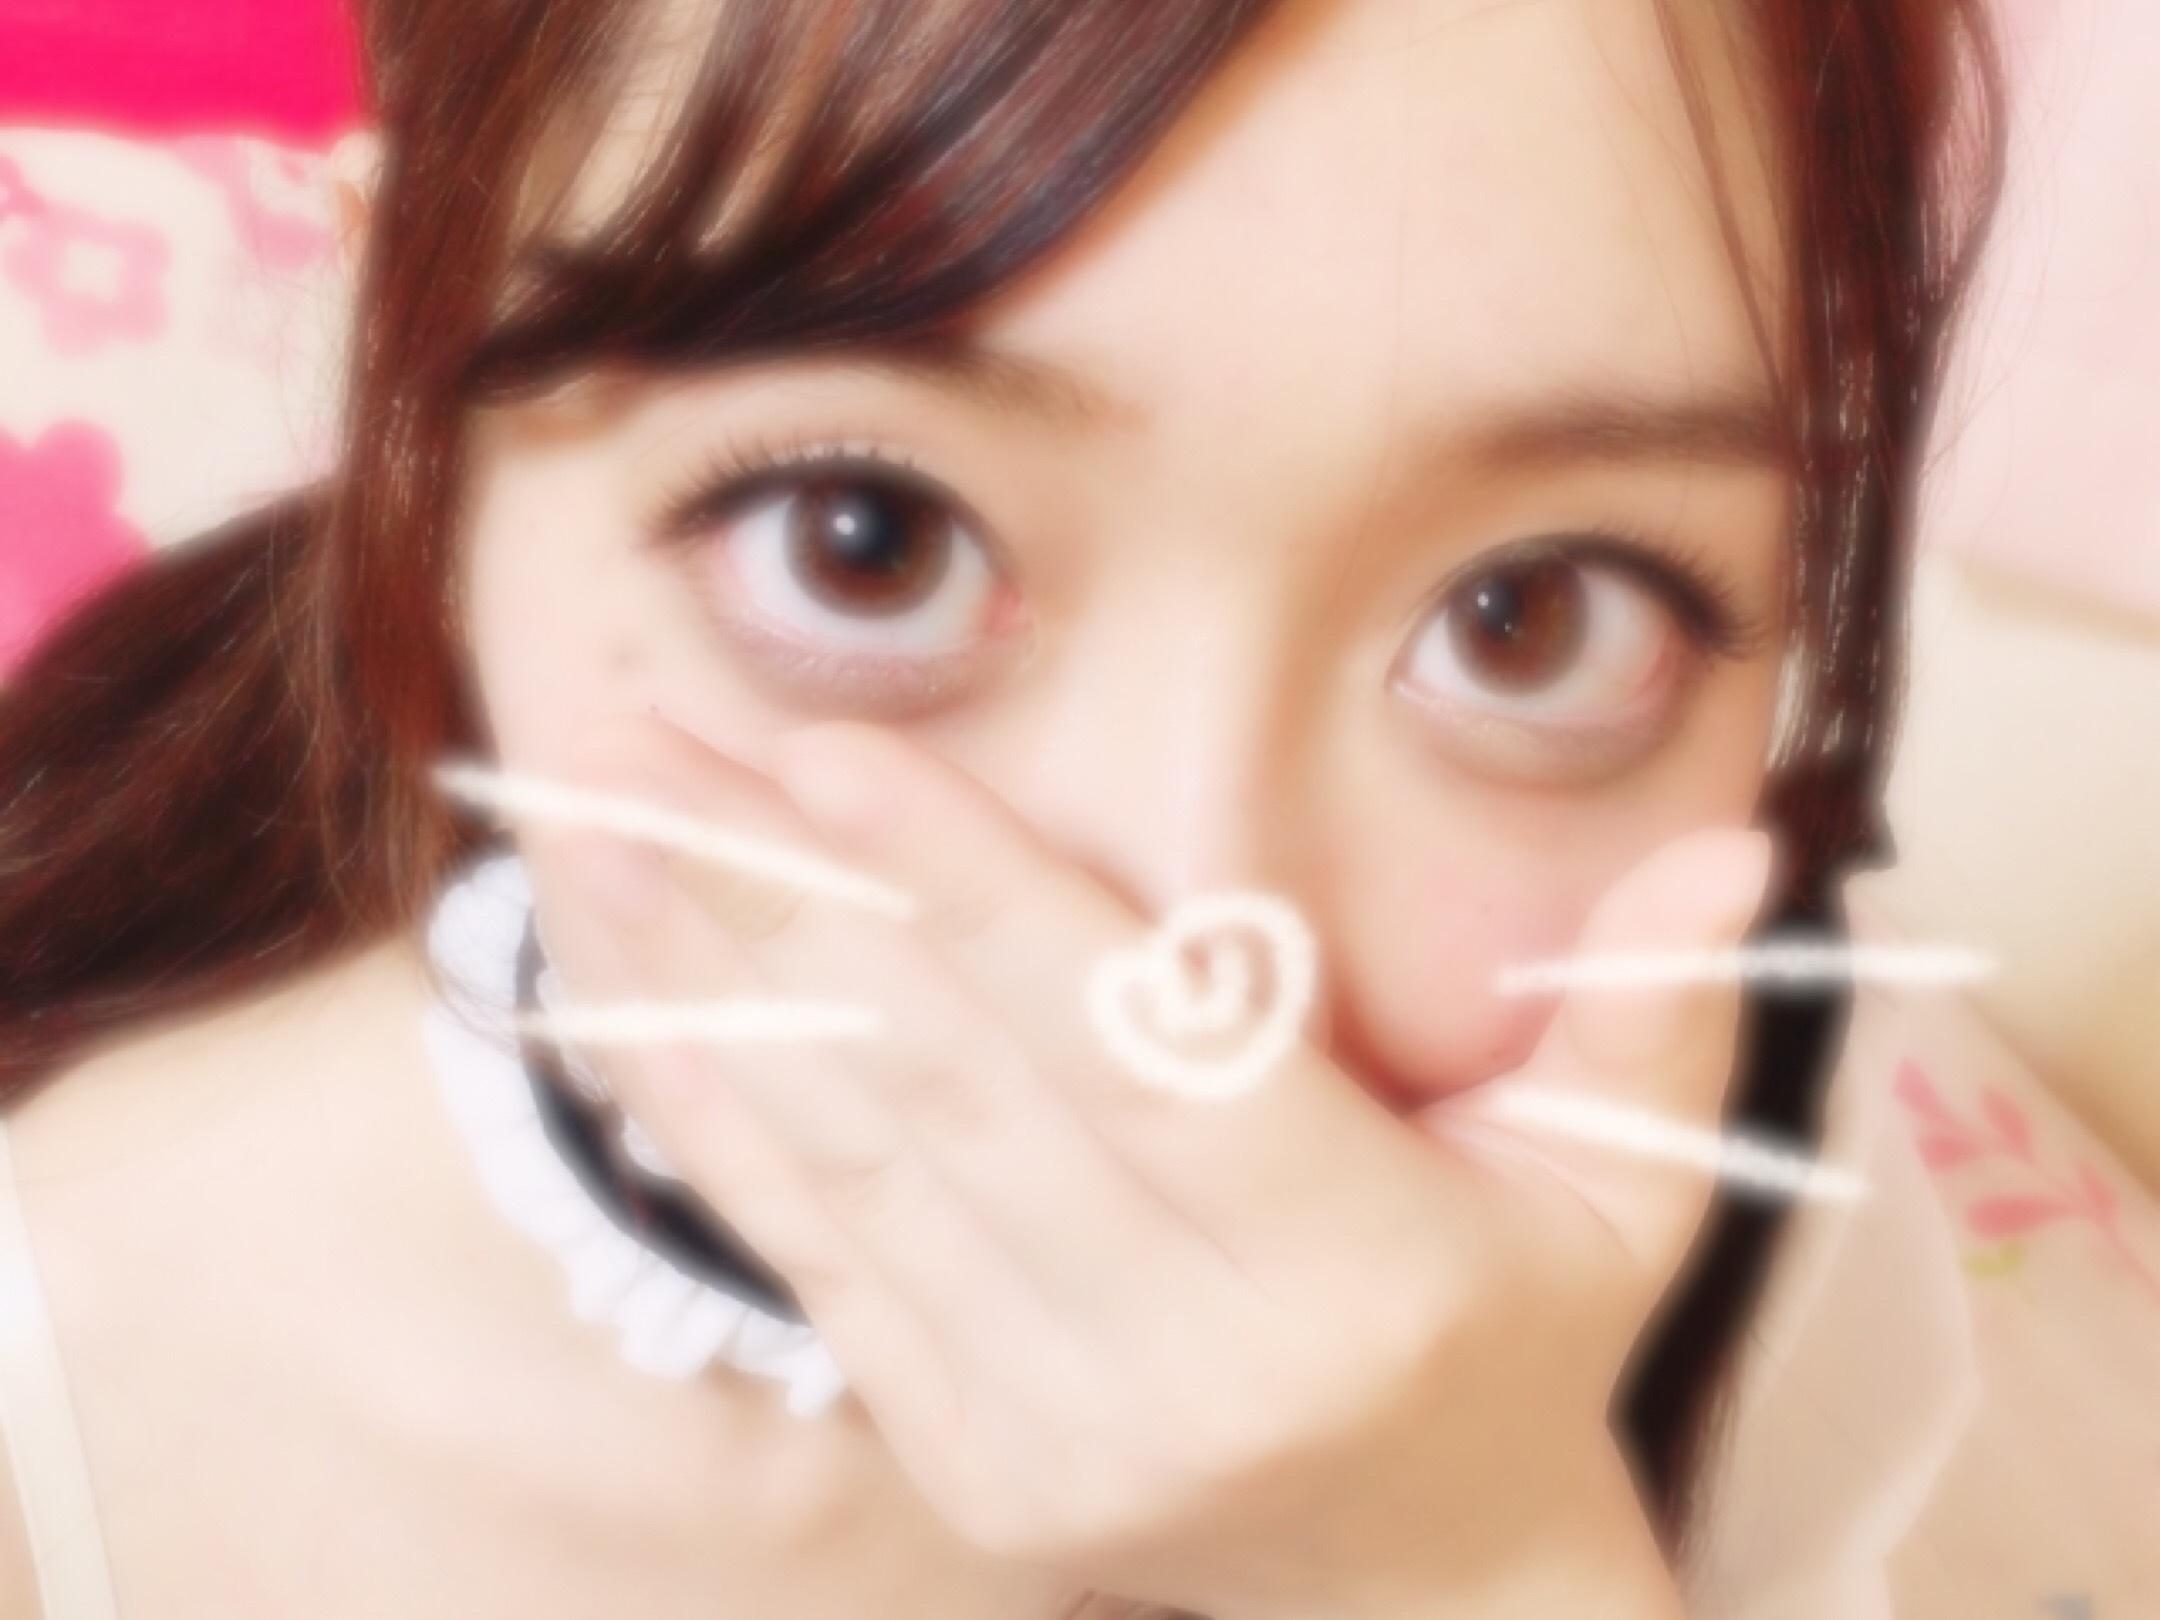 cakexxx - Japanese webcam girl